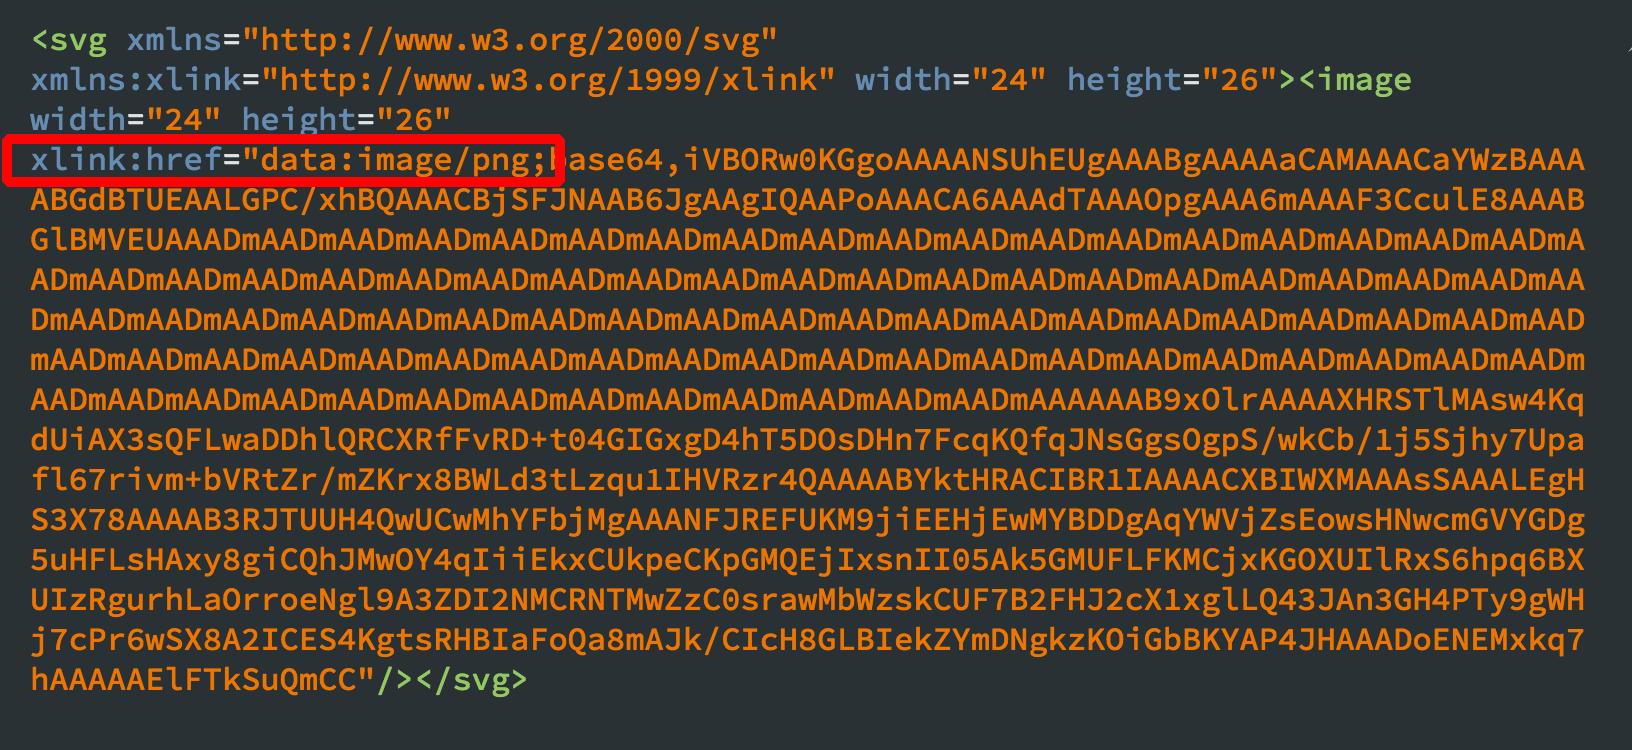 xlink:href属性を赤枠のように書き換えよう